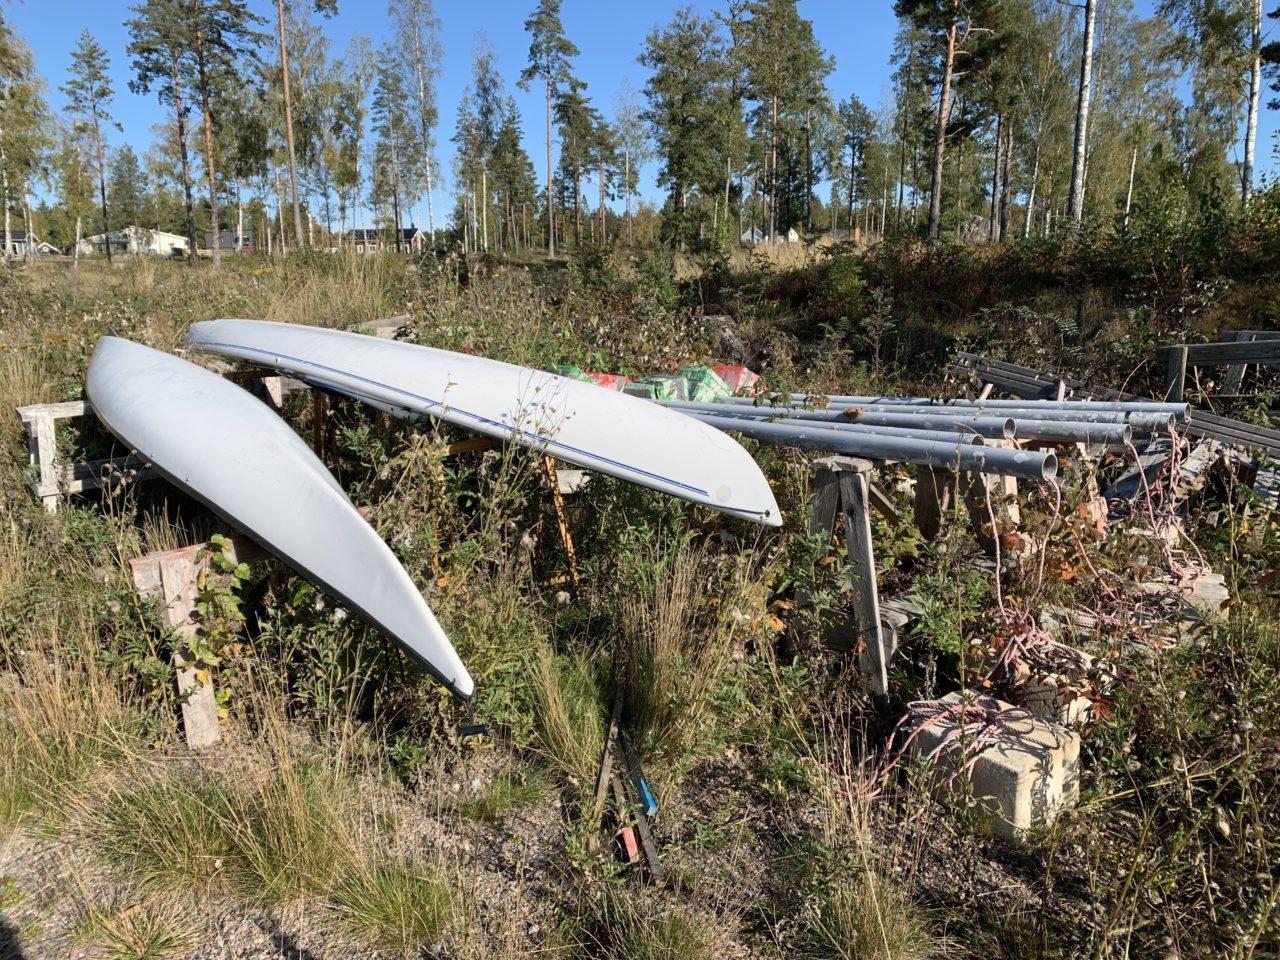 Kayak Winter Storage At Oceanside Forest